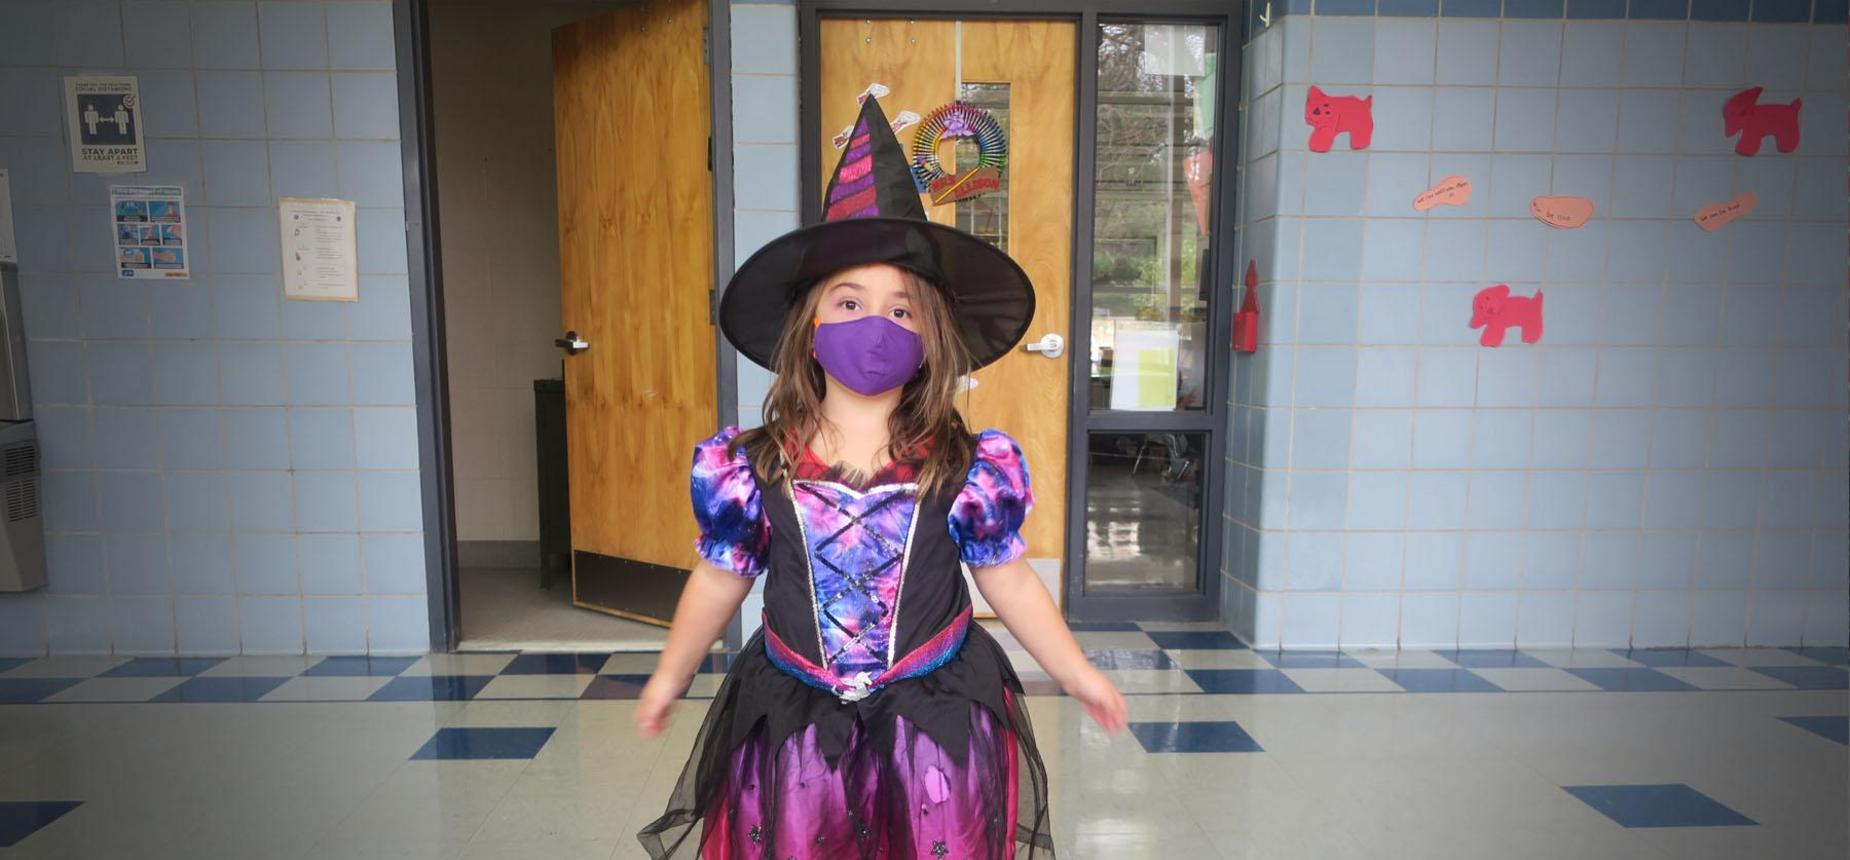 Elementary Honeoye student playing halloween games